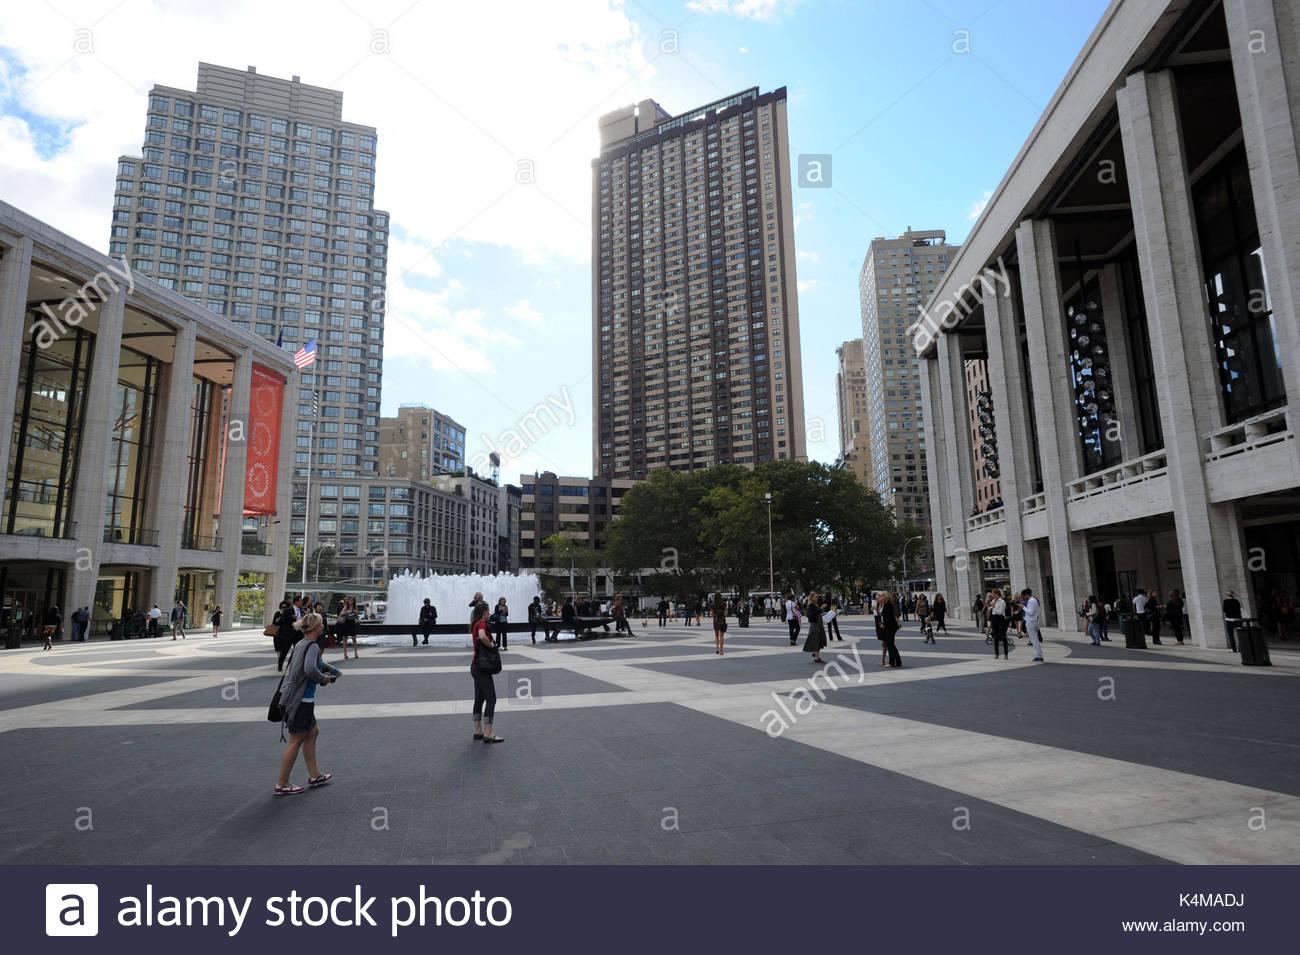 Lincoln center new york city stock photos lincoln center for Mercedes benz of manhattan new york city